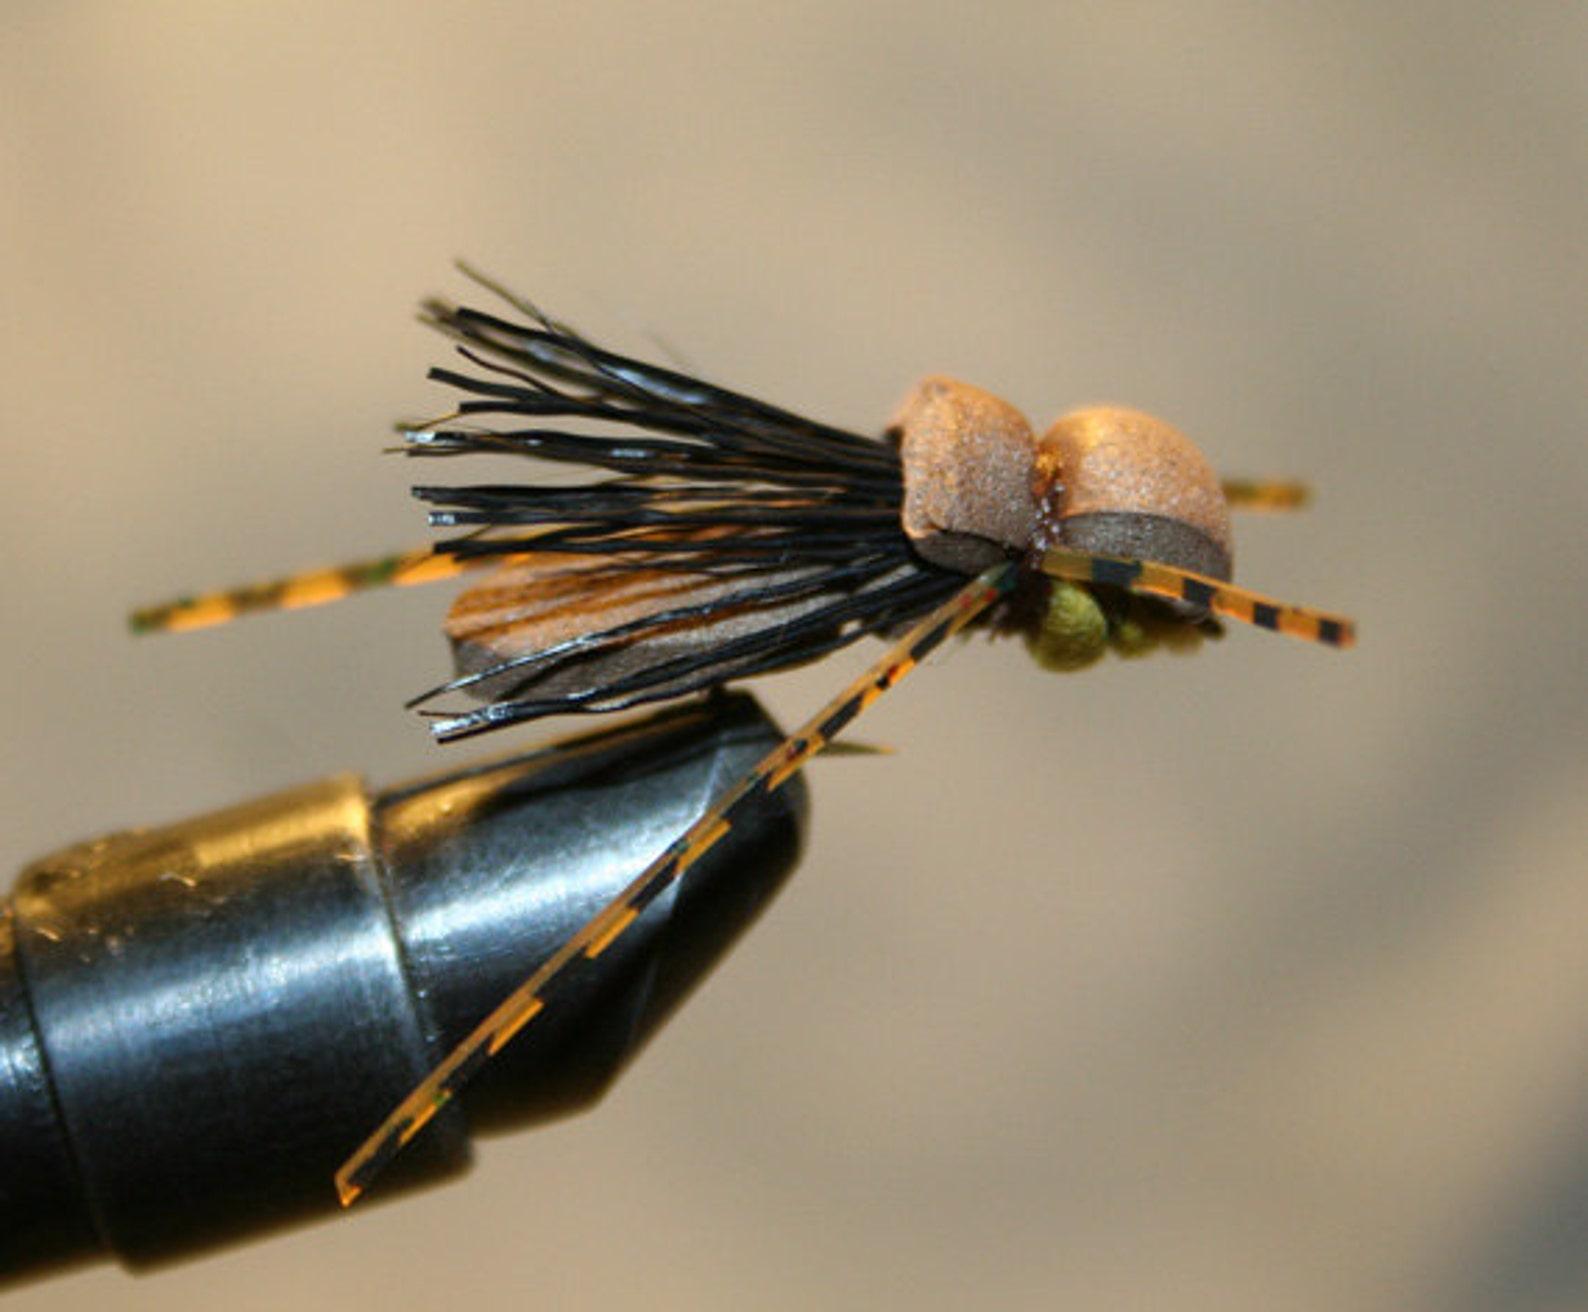 fly fishing flies - HD1588×1312